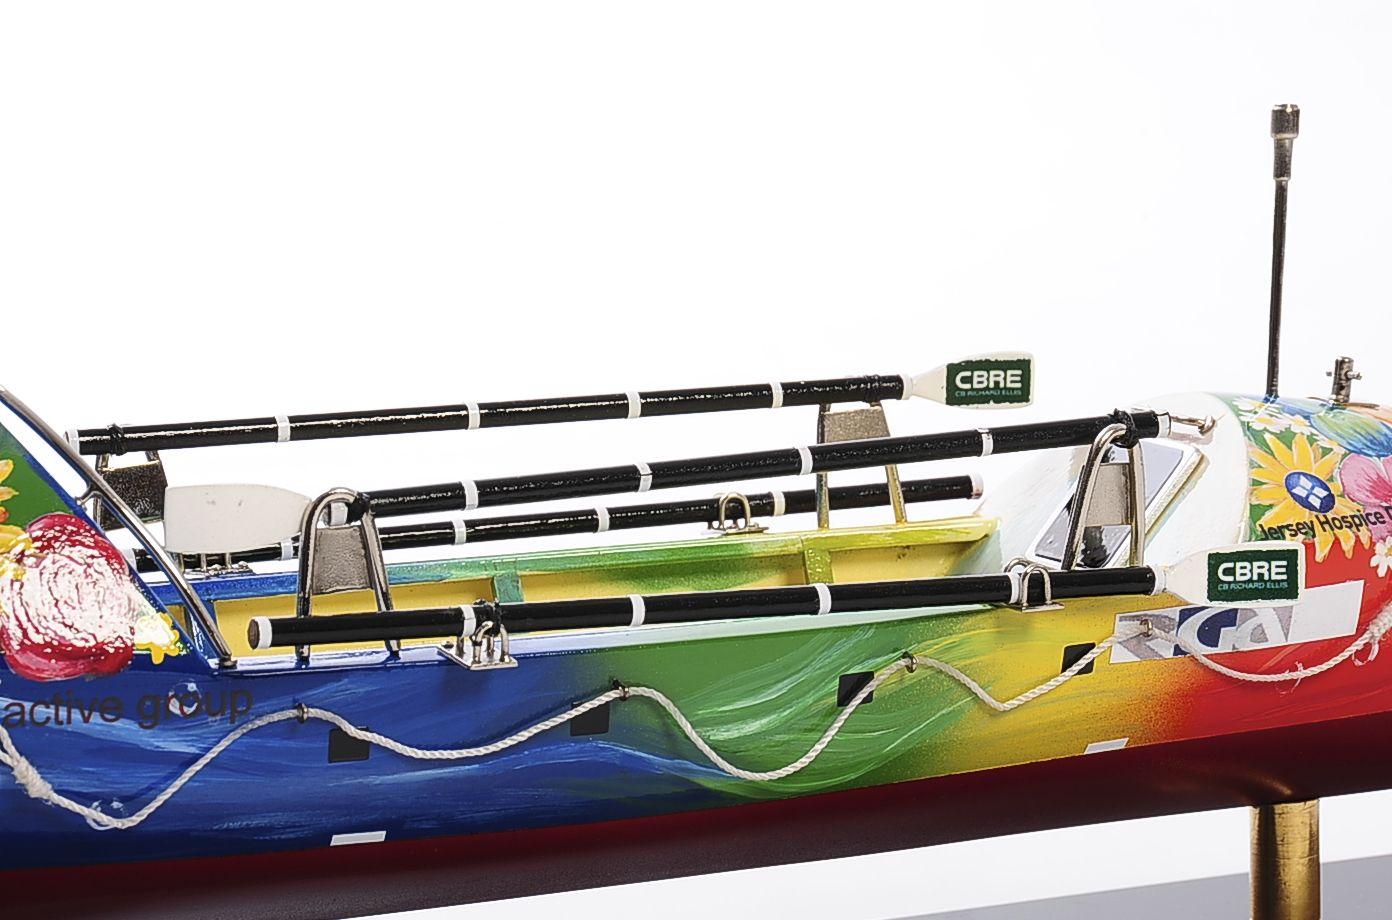 1389-8751-Ocean-Rowing-Boat-Model